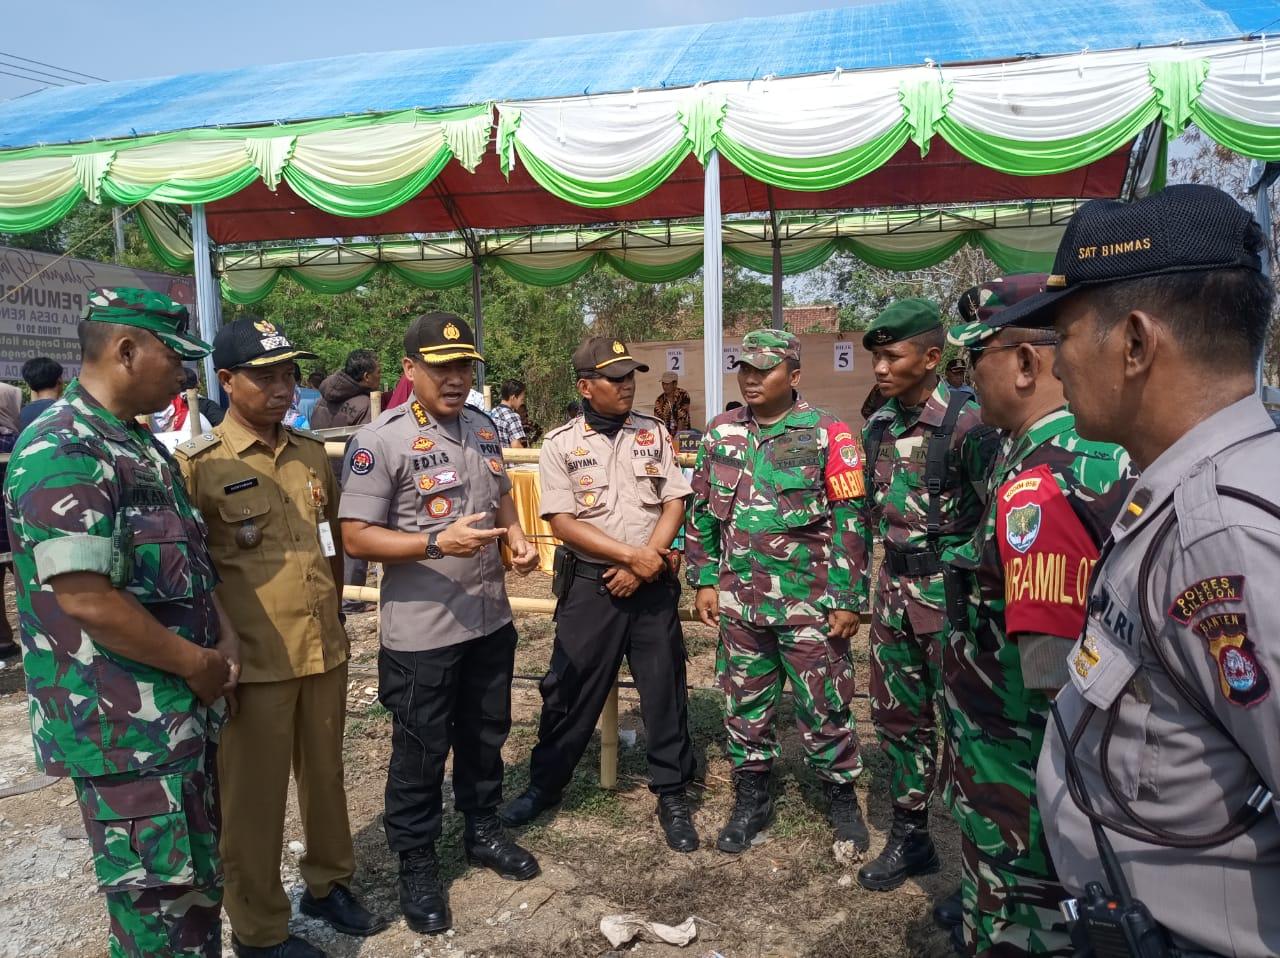 Kabid Humas Polda Banten Pantau Pelaksanaan Pilkades Serentak Kabupaten Tangerang